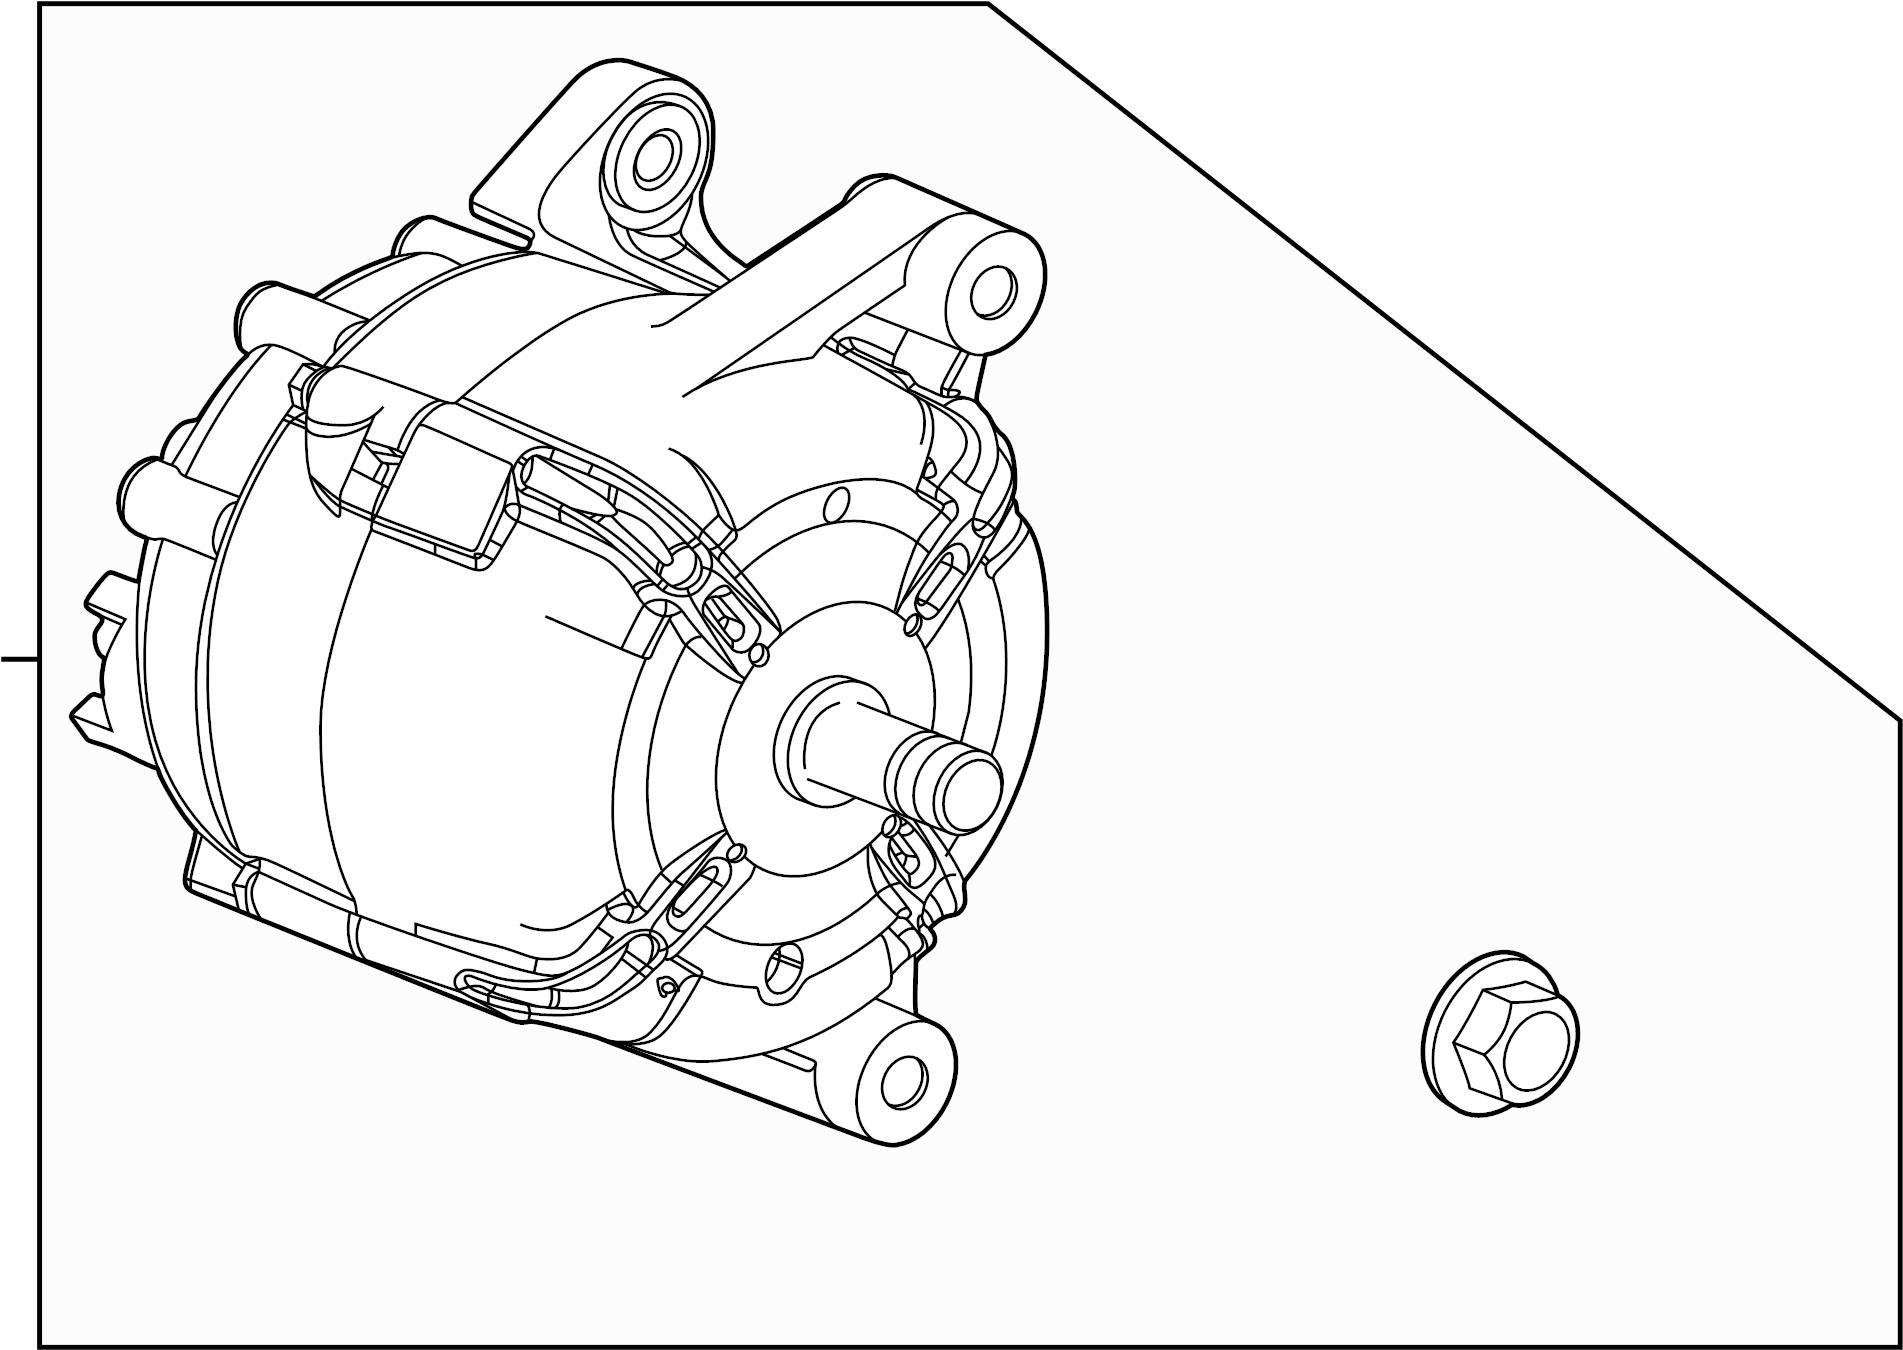 Chevrolet Cruze LTZ Generator. Buick; chevrolet; chevrolet